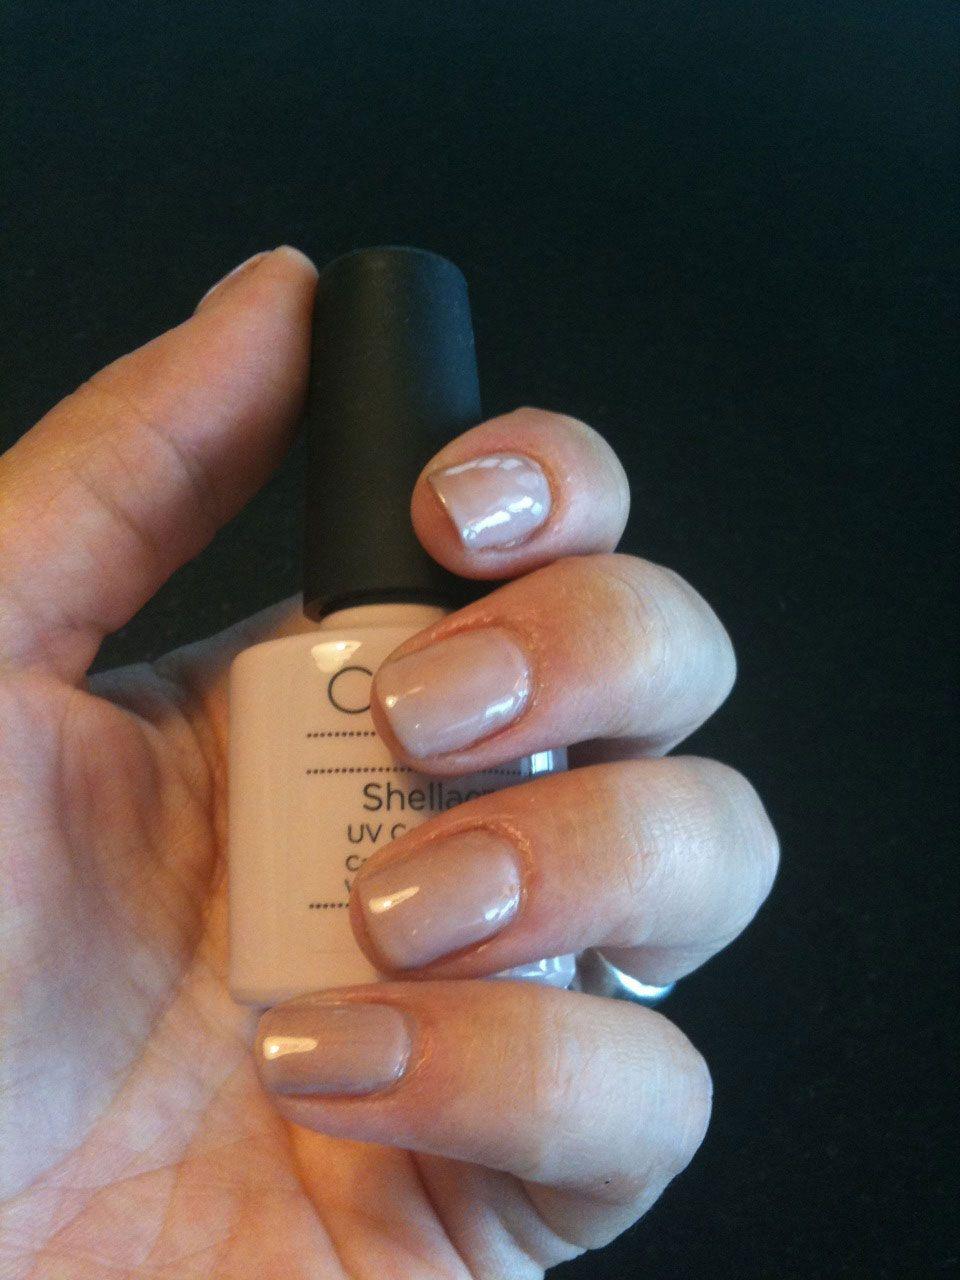 Cnd Shellac 2 Week Manicure Gel Nail Colors Shellac Nail Colors Shellac Manicure